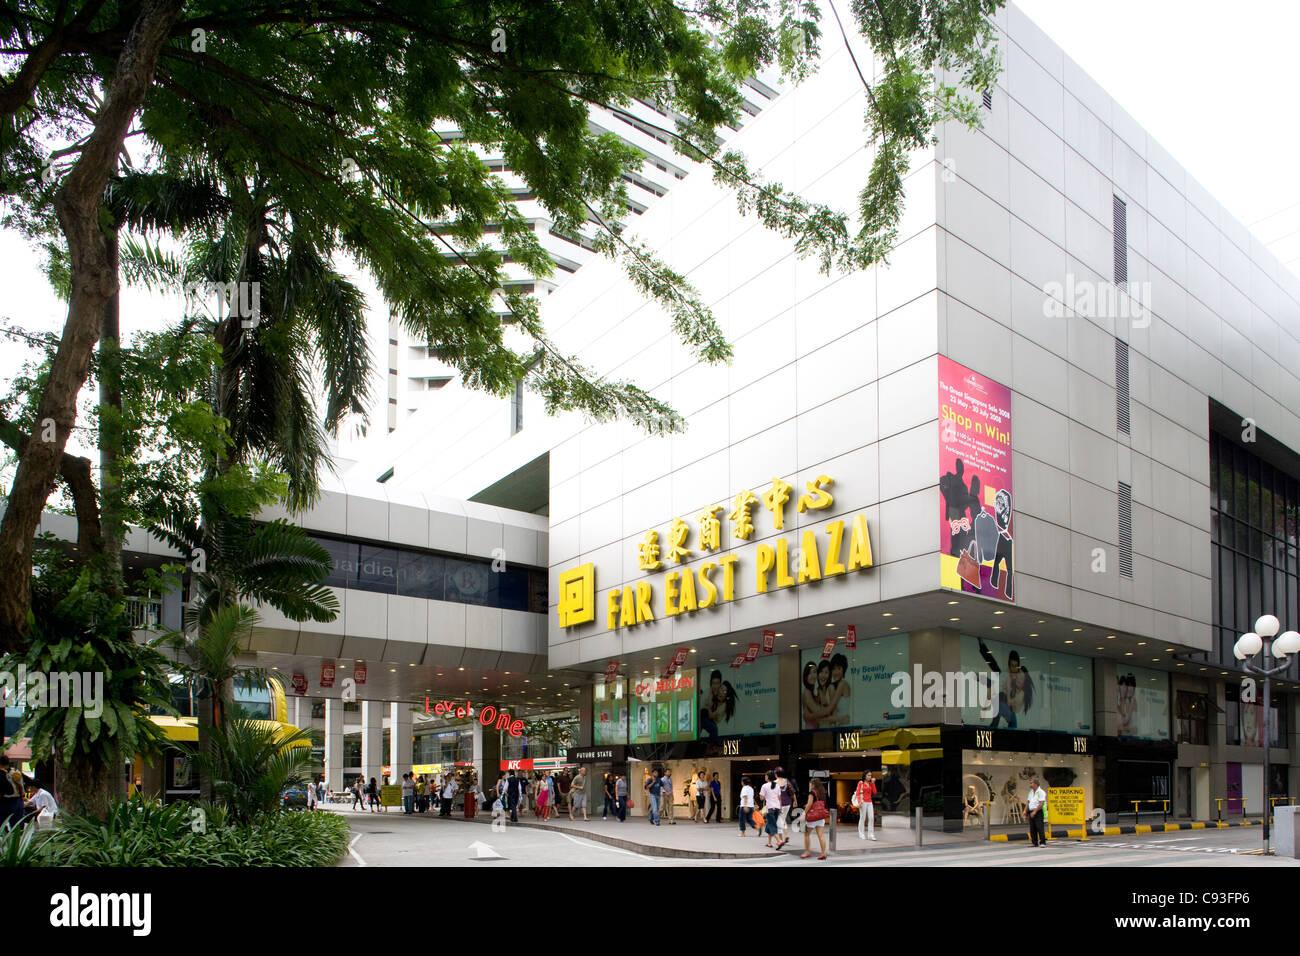 Far East Plaza shopping mall Imagen De Stock